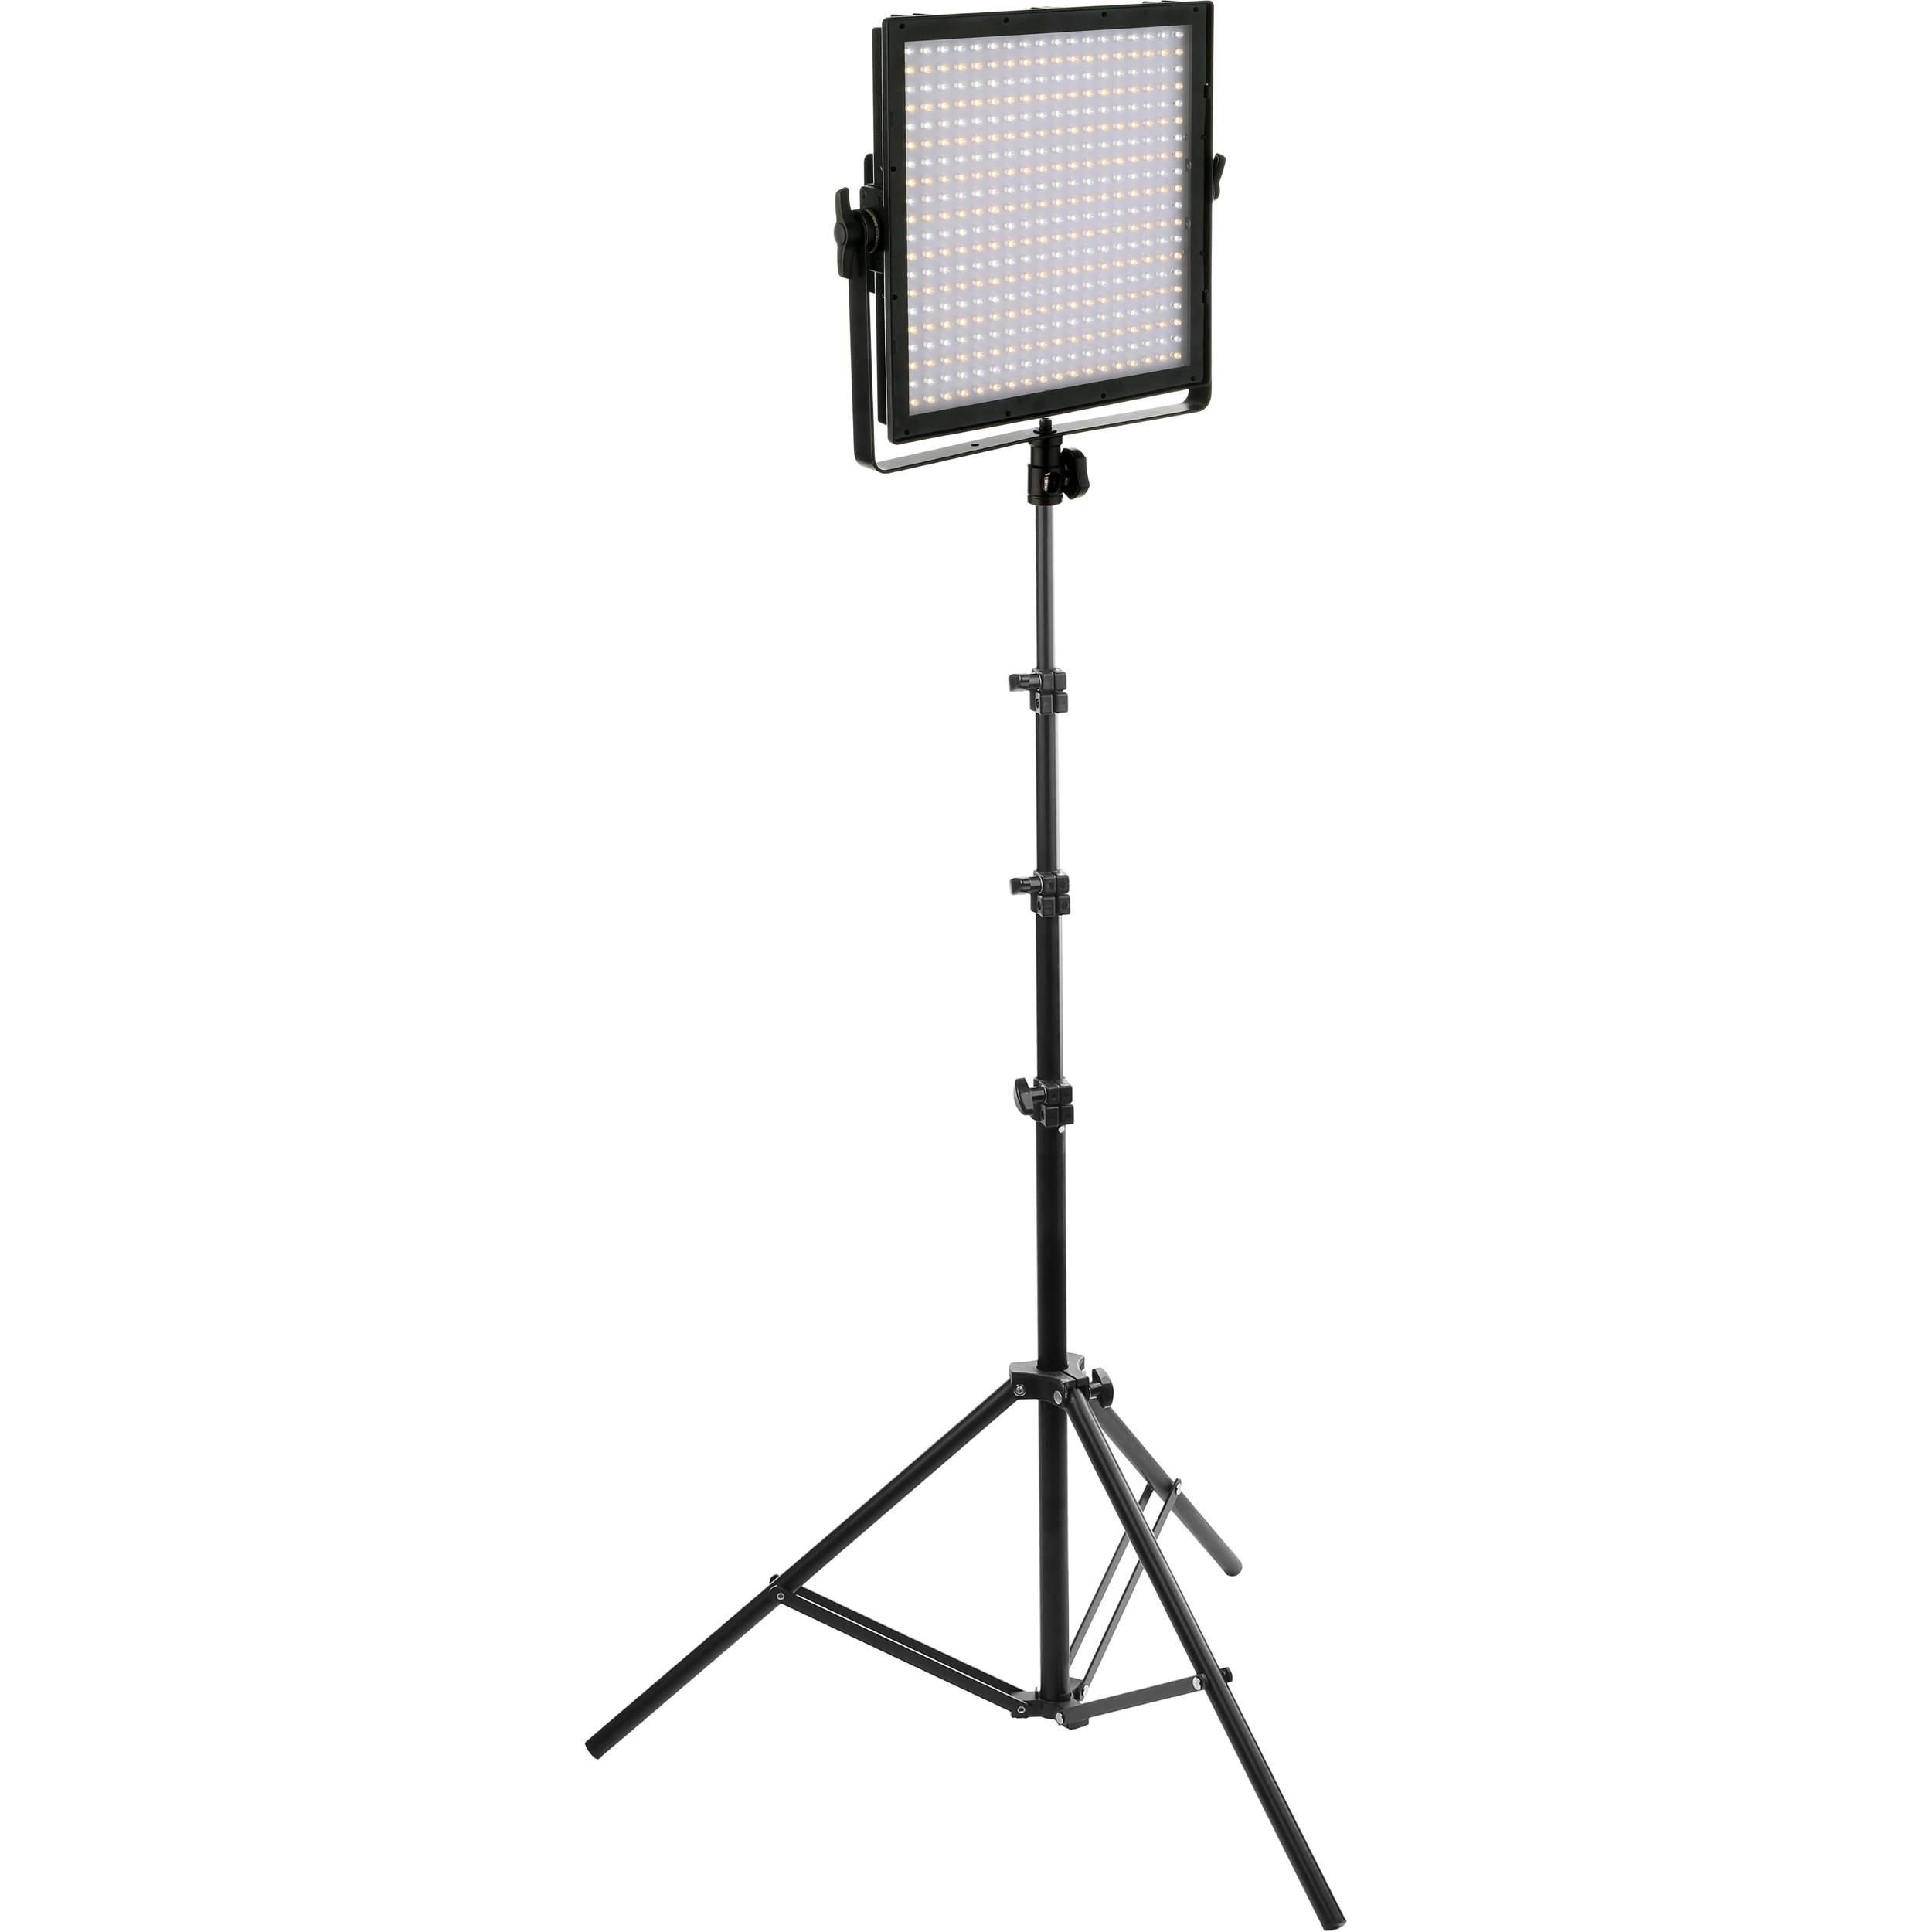 Genaray Spectroled Essential 360 Bi Color Led Sp E 360b Kii B Amp H